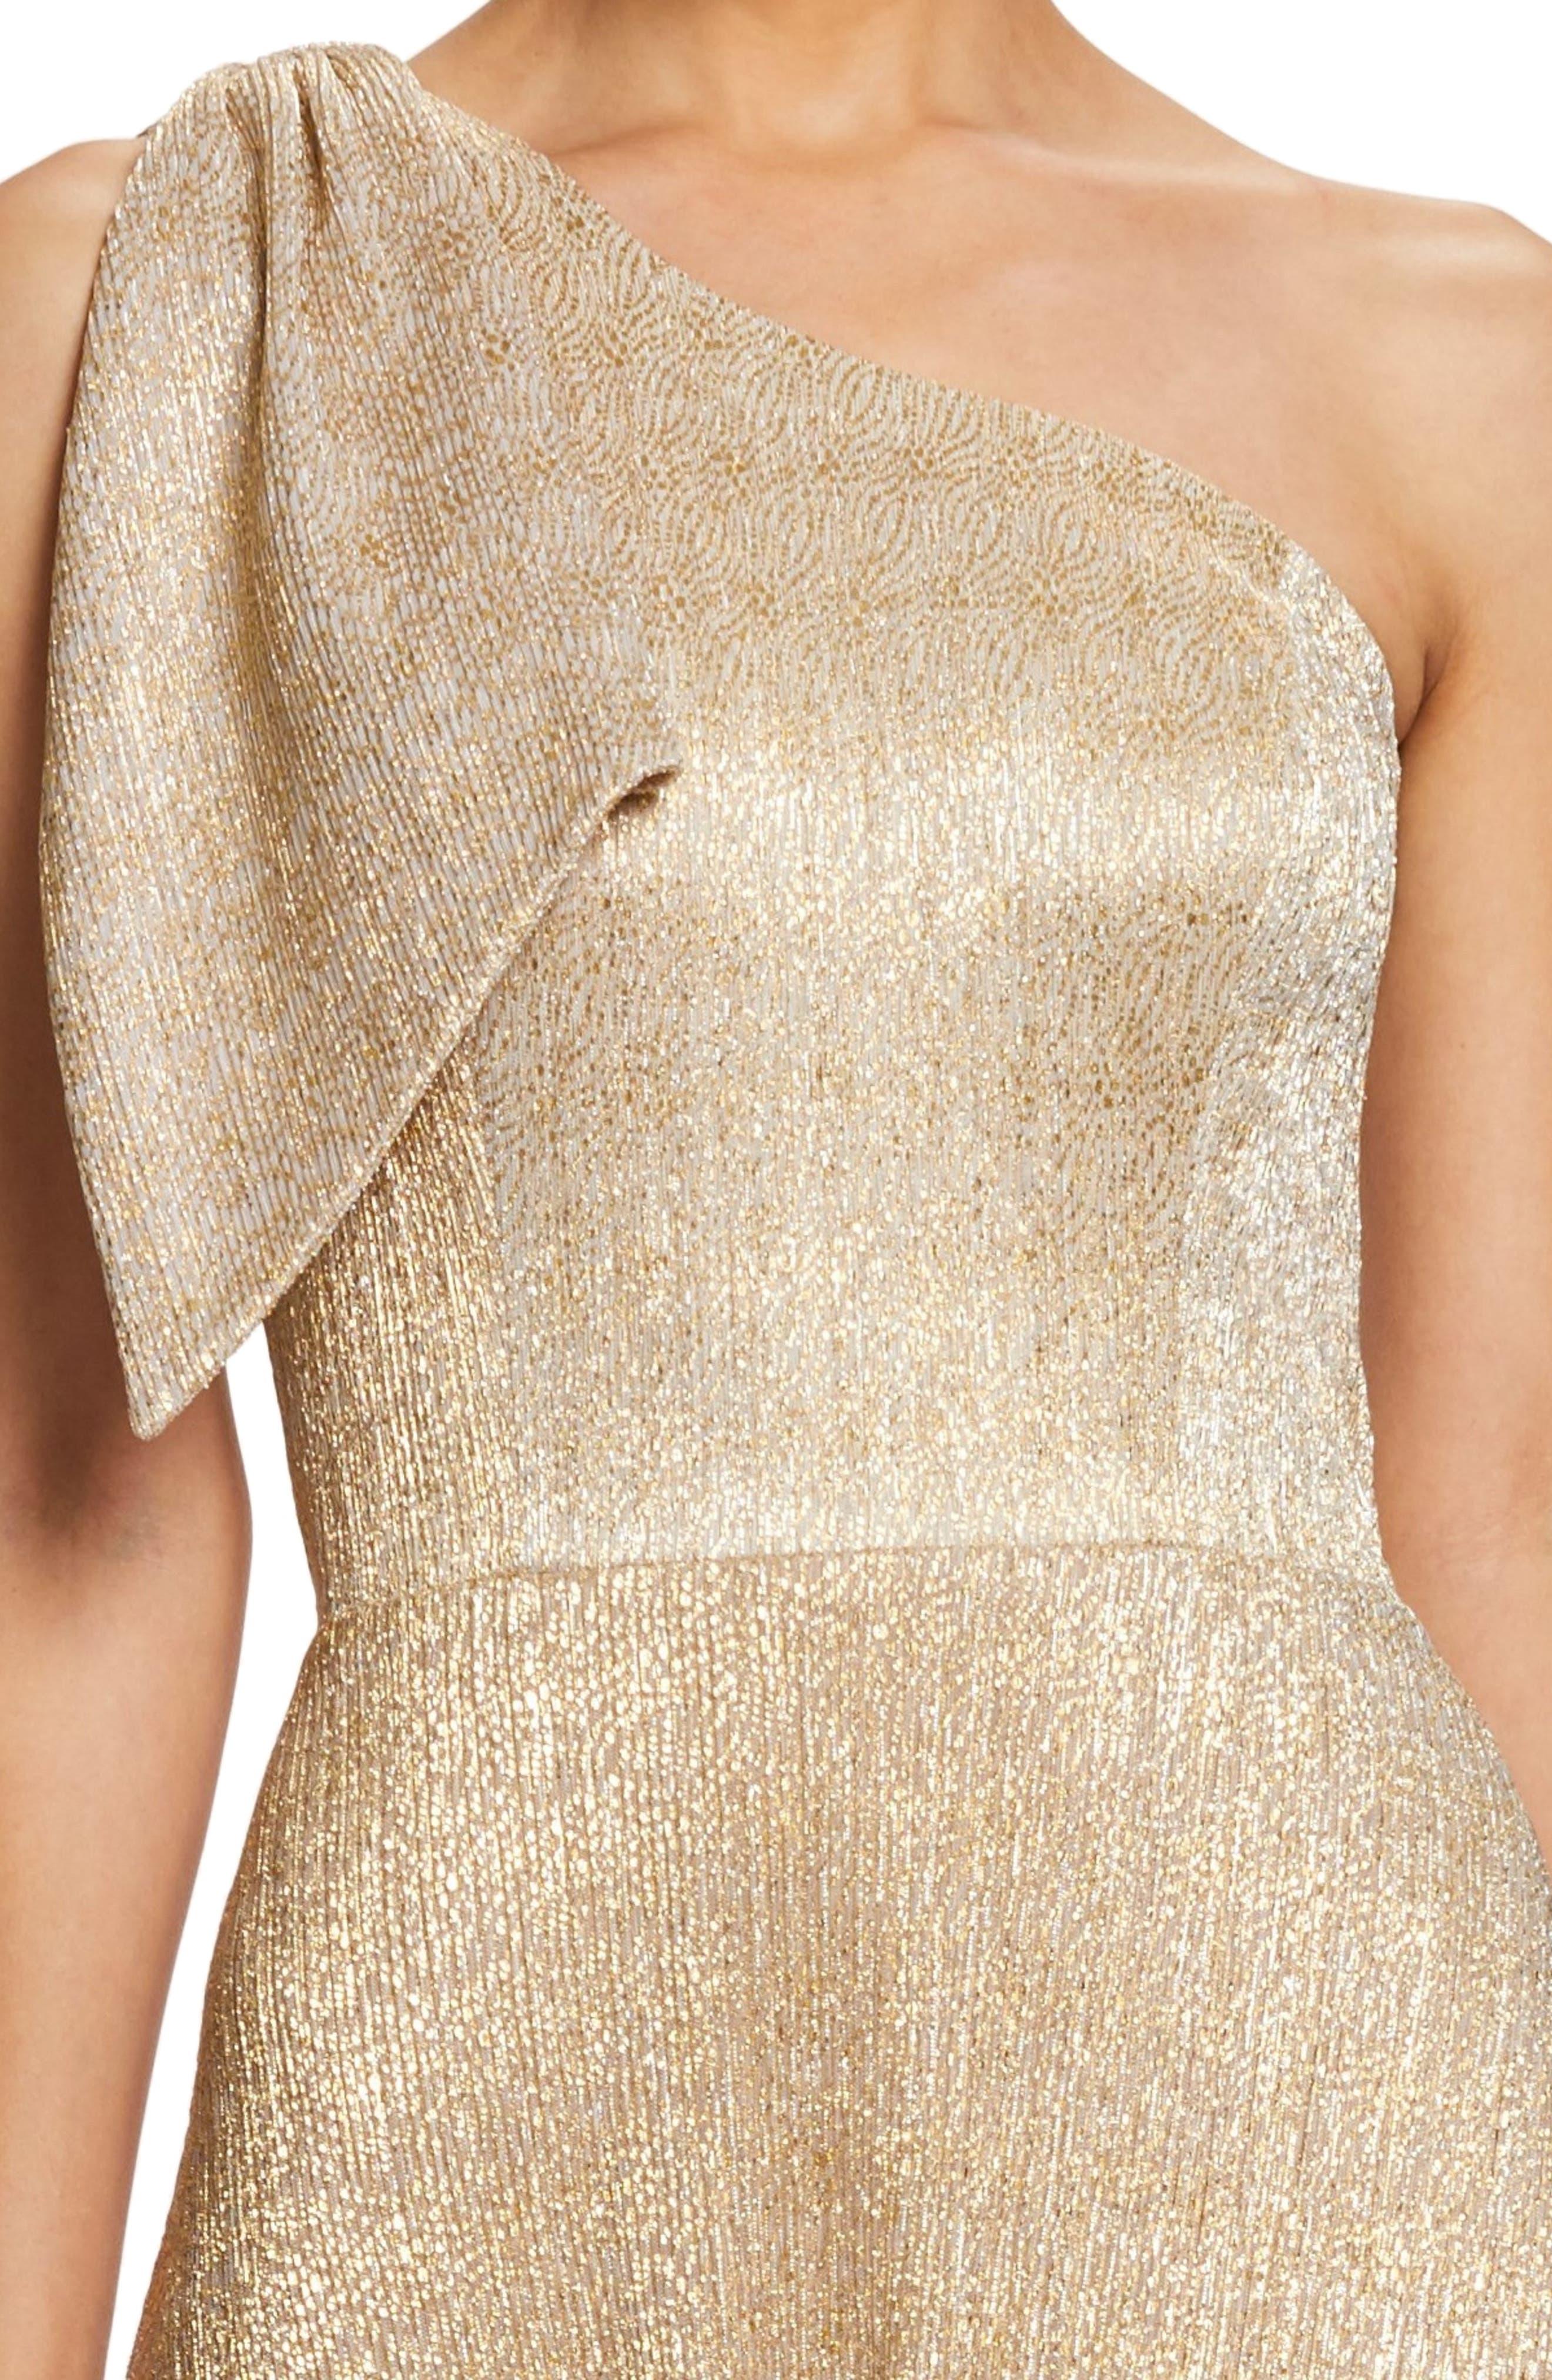 Savannah One-Shoulder Gown,                             Alternate thumbnail 4, color,                             GOLD